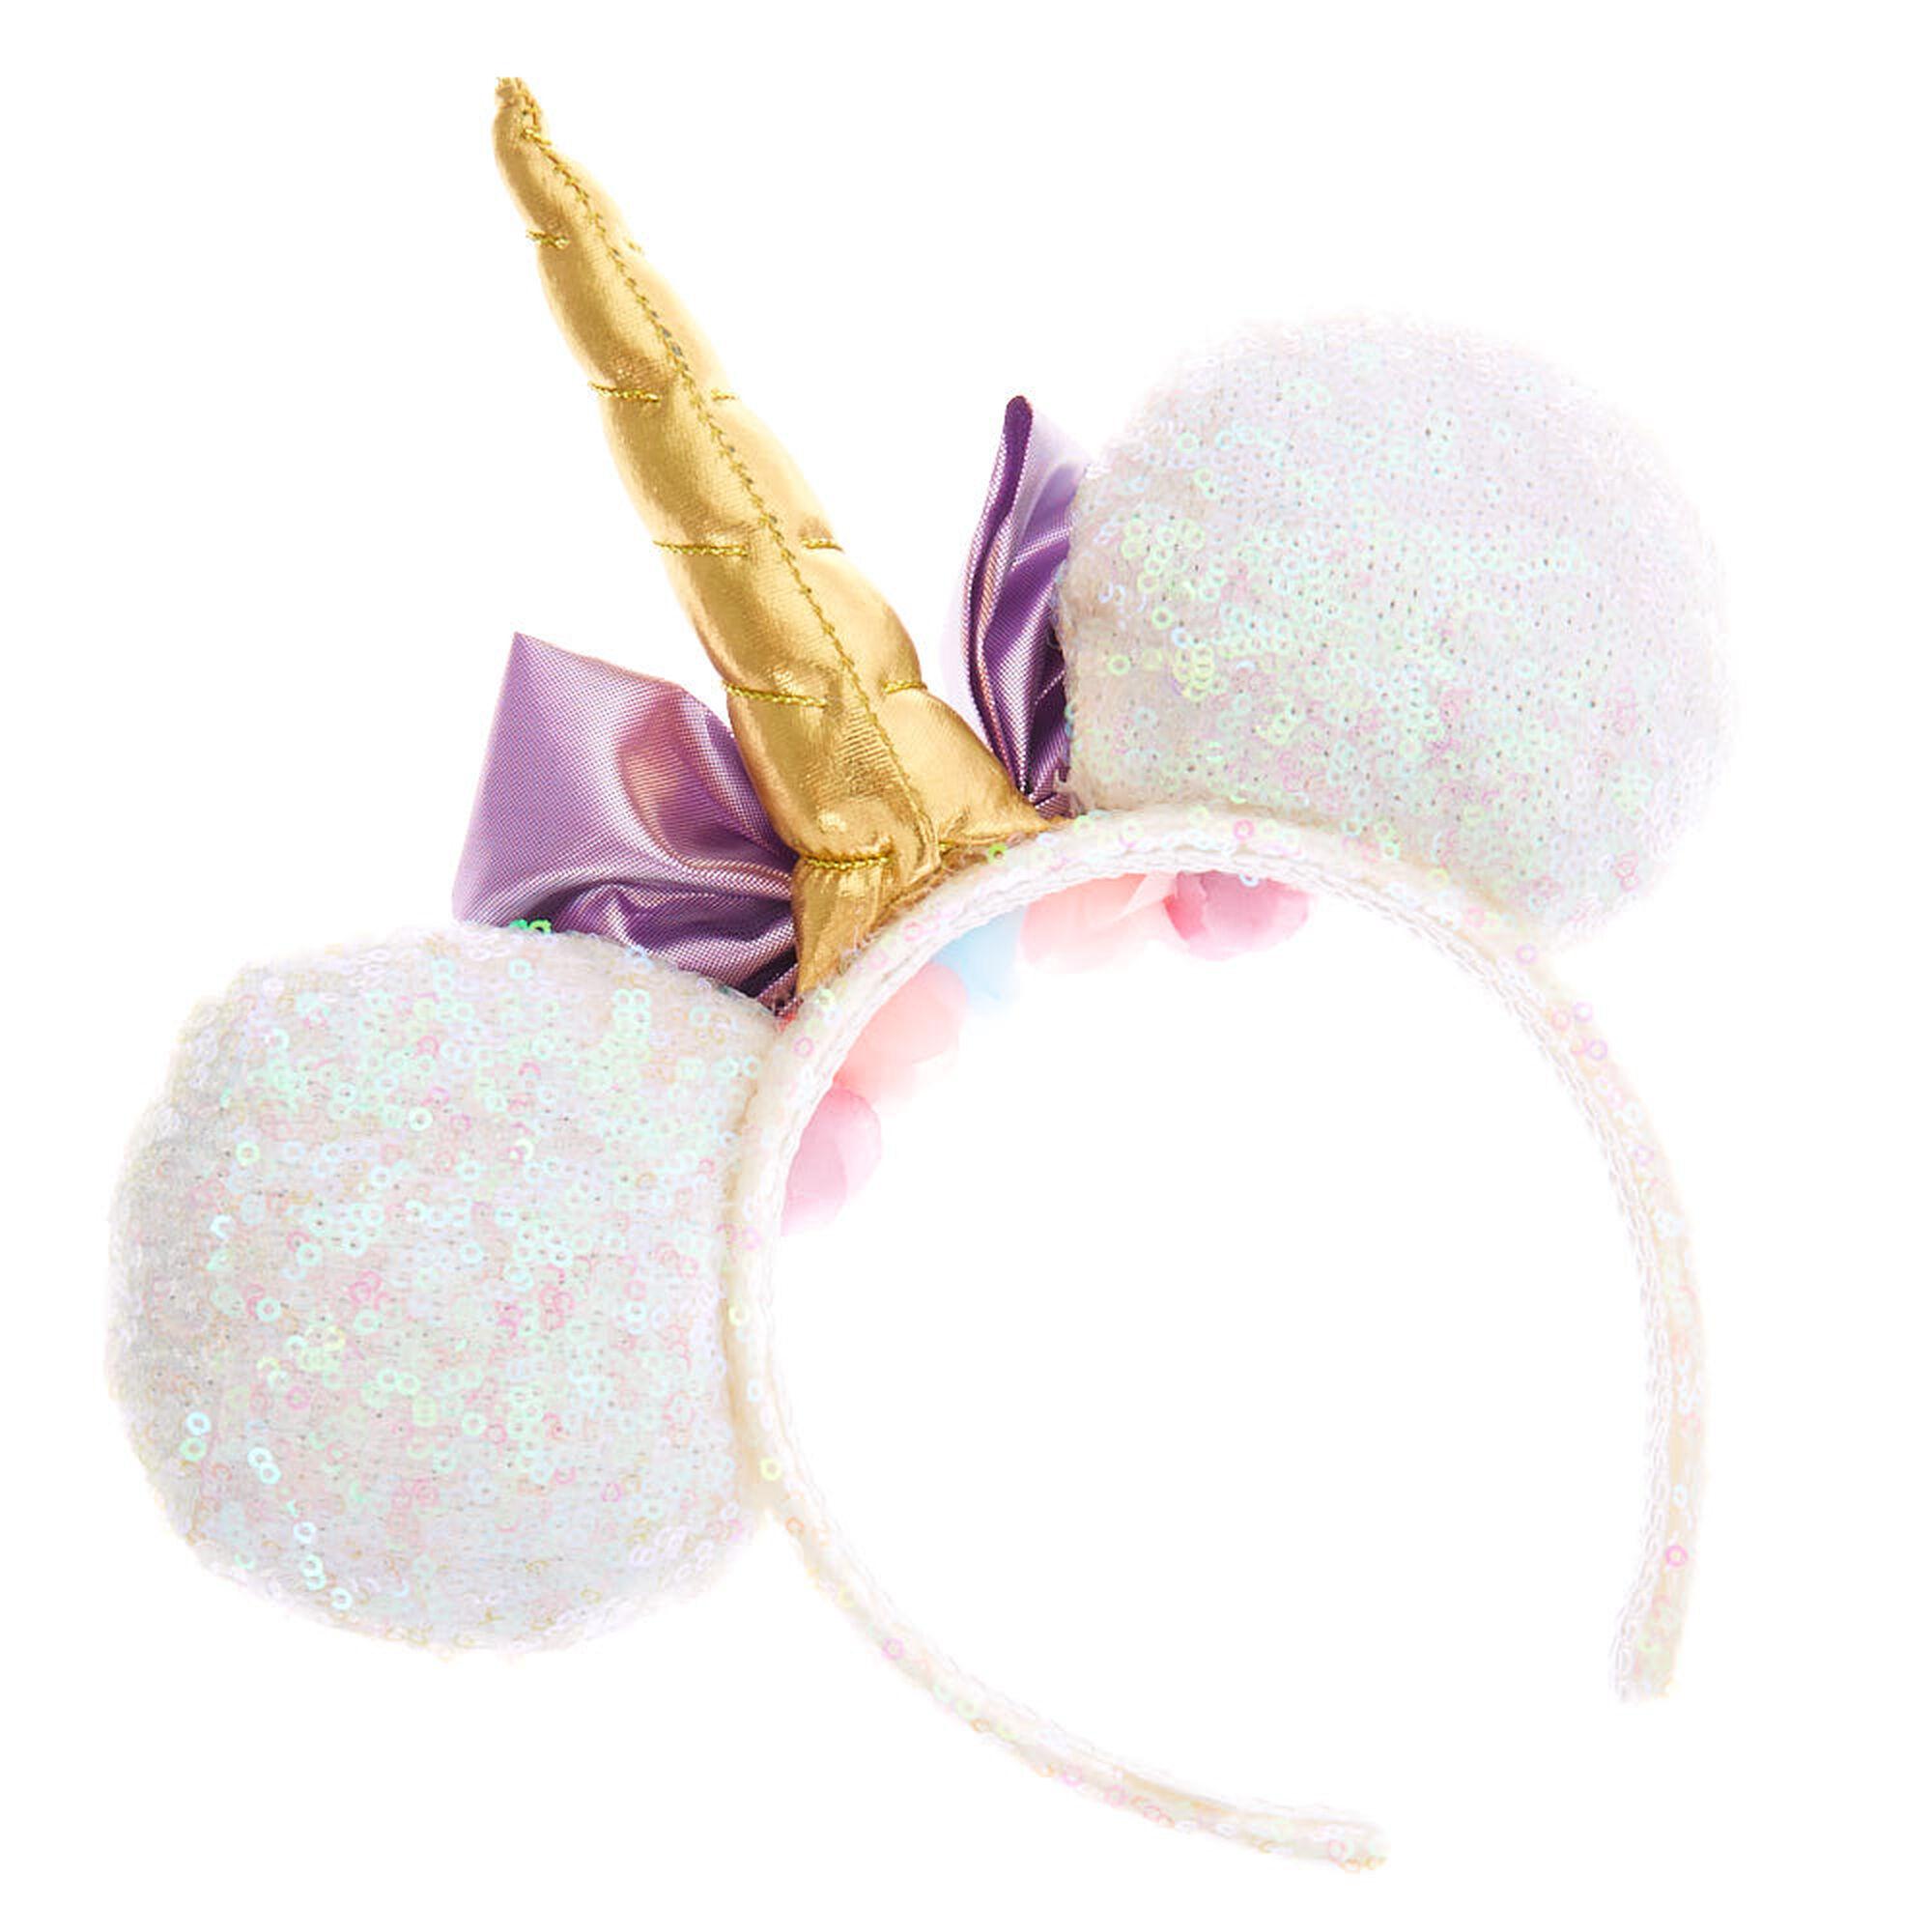 e3aa3c76dcc0 Disney® Sequin Unicorn Minnie Mouse Ear Headband - White | Claire's